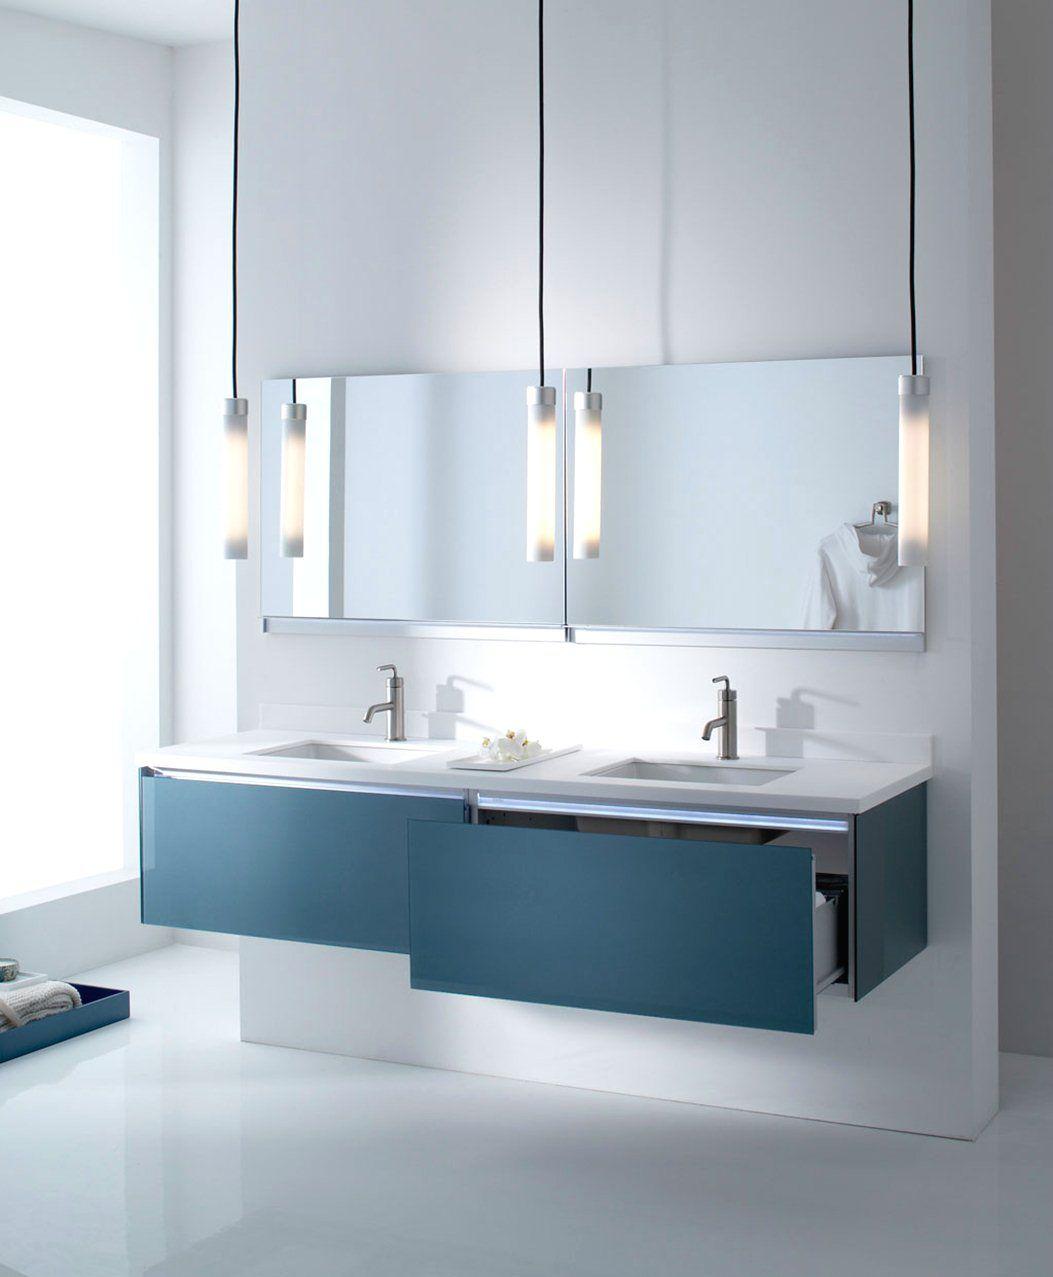 Bathroom light fixtures edmonton bathroom design 2017 2018 bathroom light fixtures edmonton arubaitofo Gallery